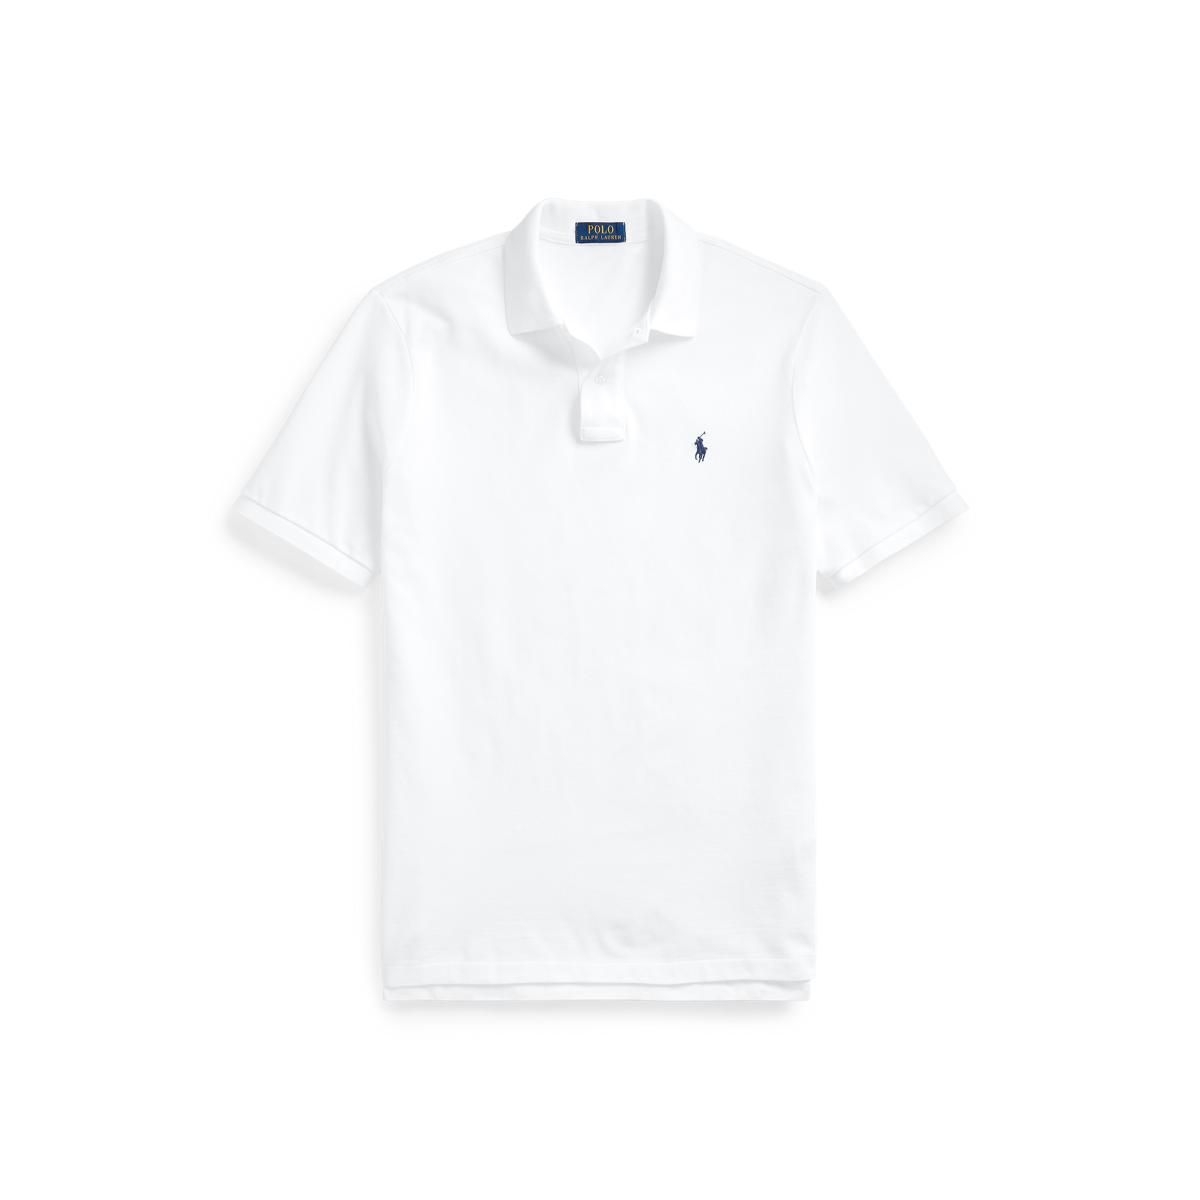 4d96ba7a8 Classic Fit Mesh Polo Shirt   Classic Fit Polo Shirts   Ralph Lauren